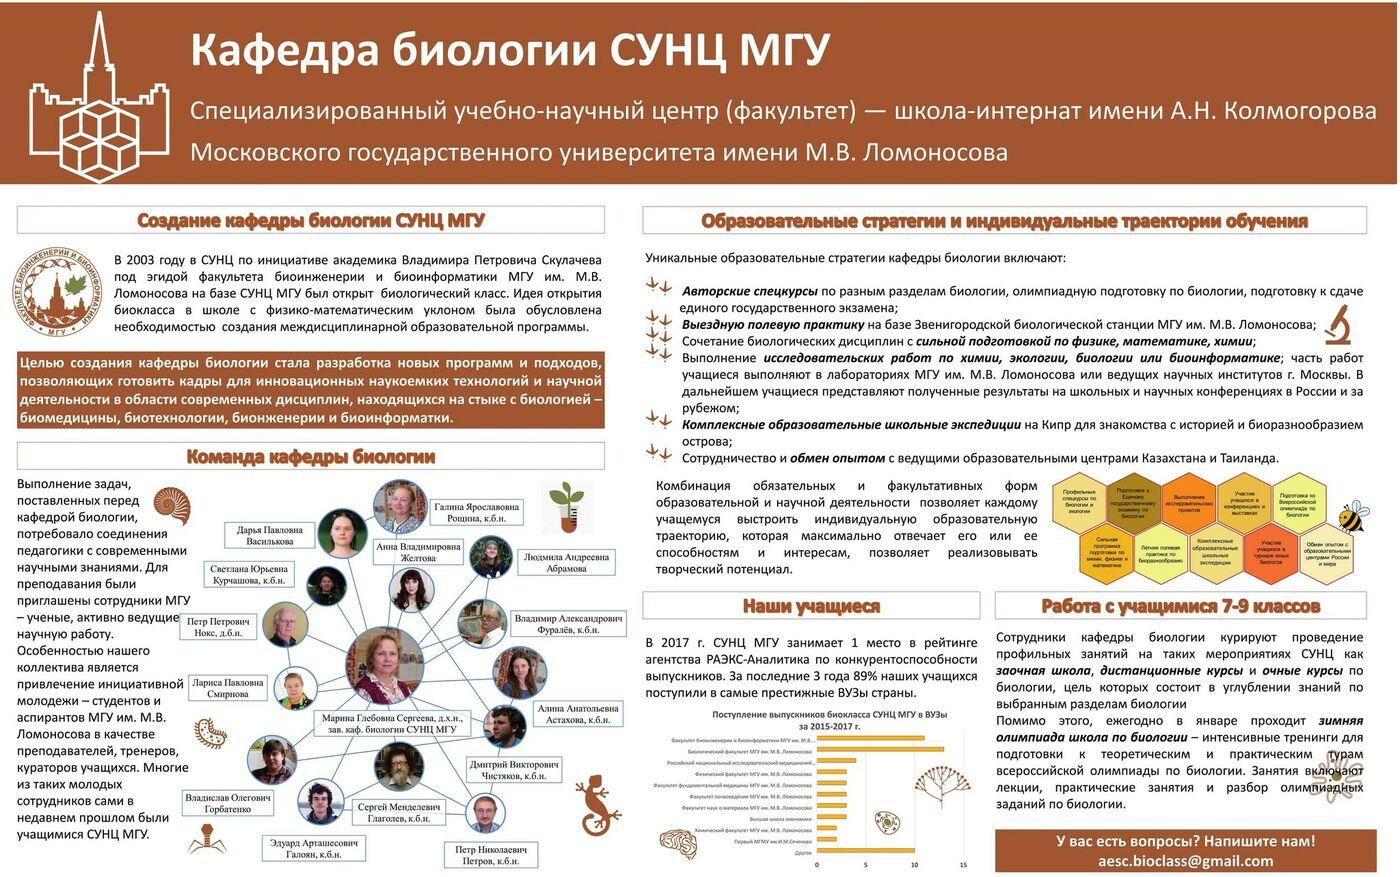 Кафедра биологии СУНЦ МГУ-min